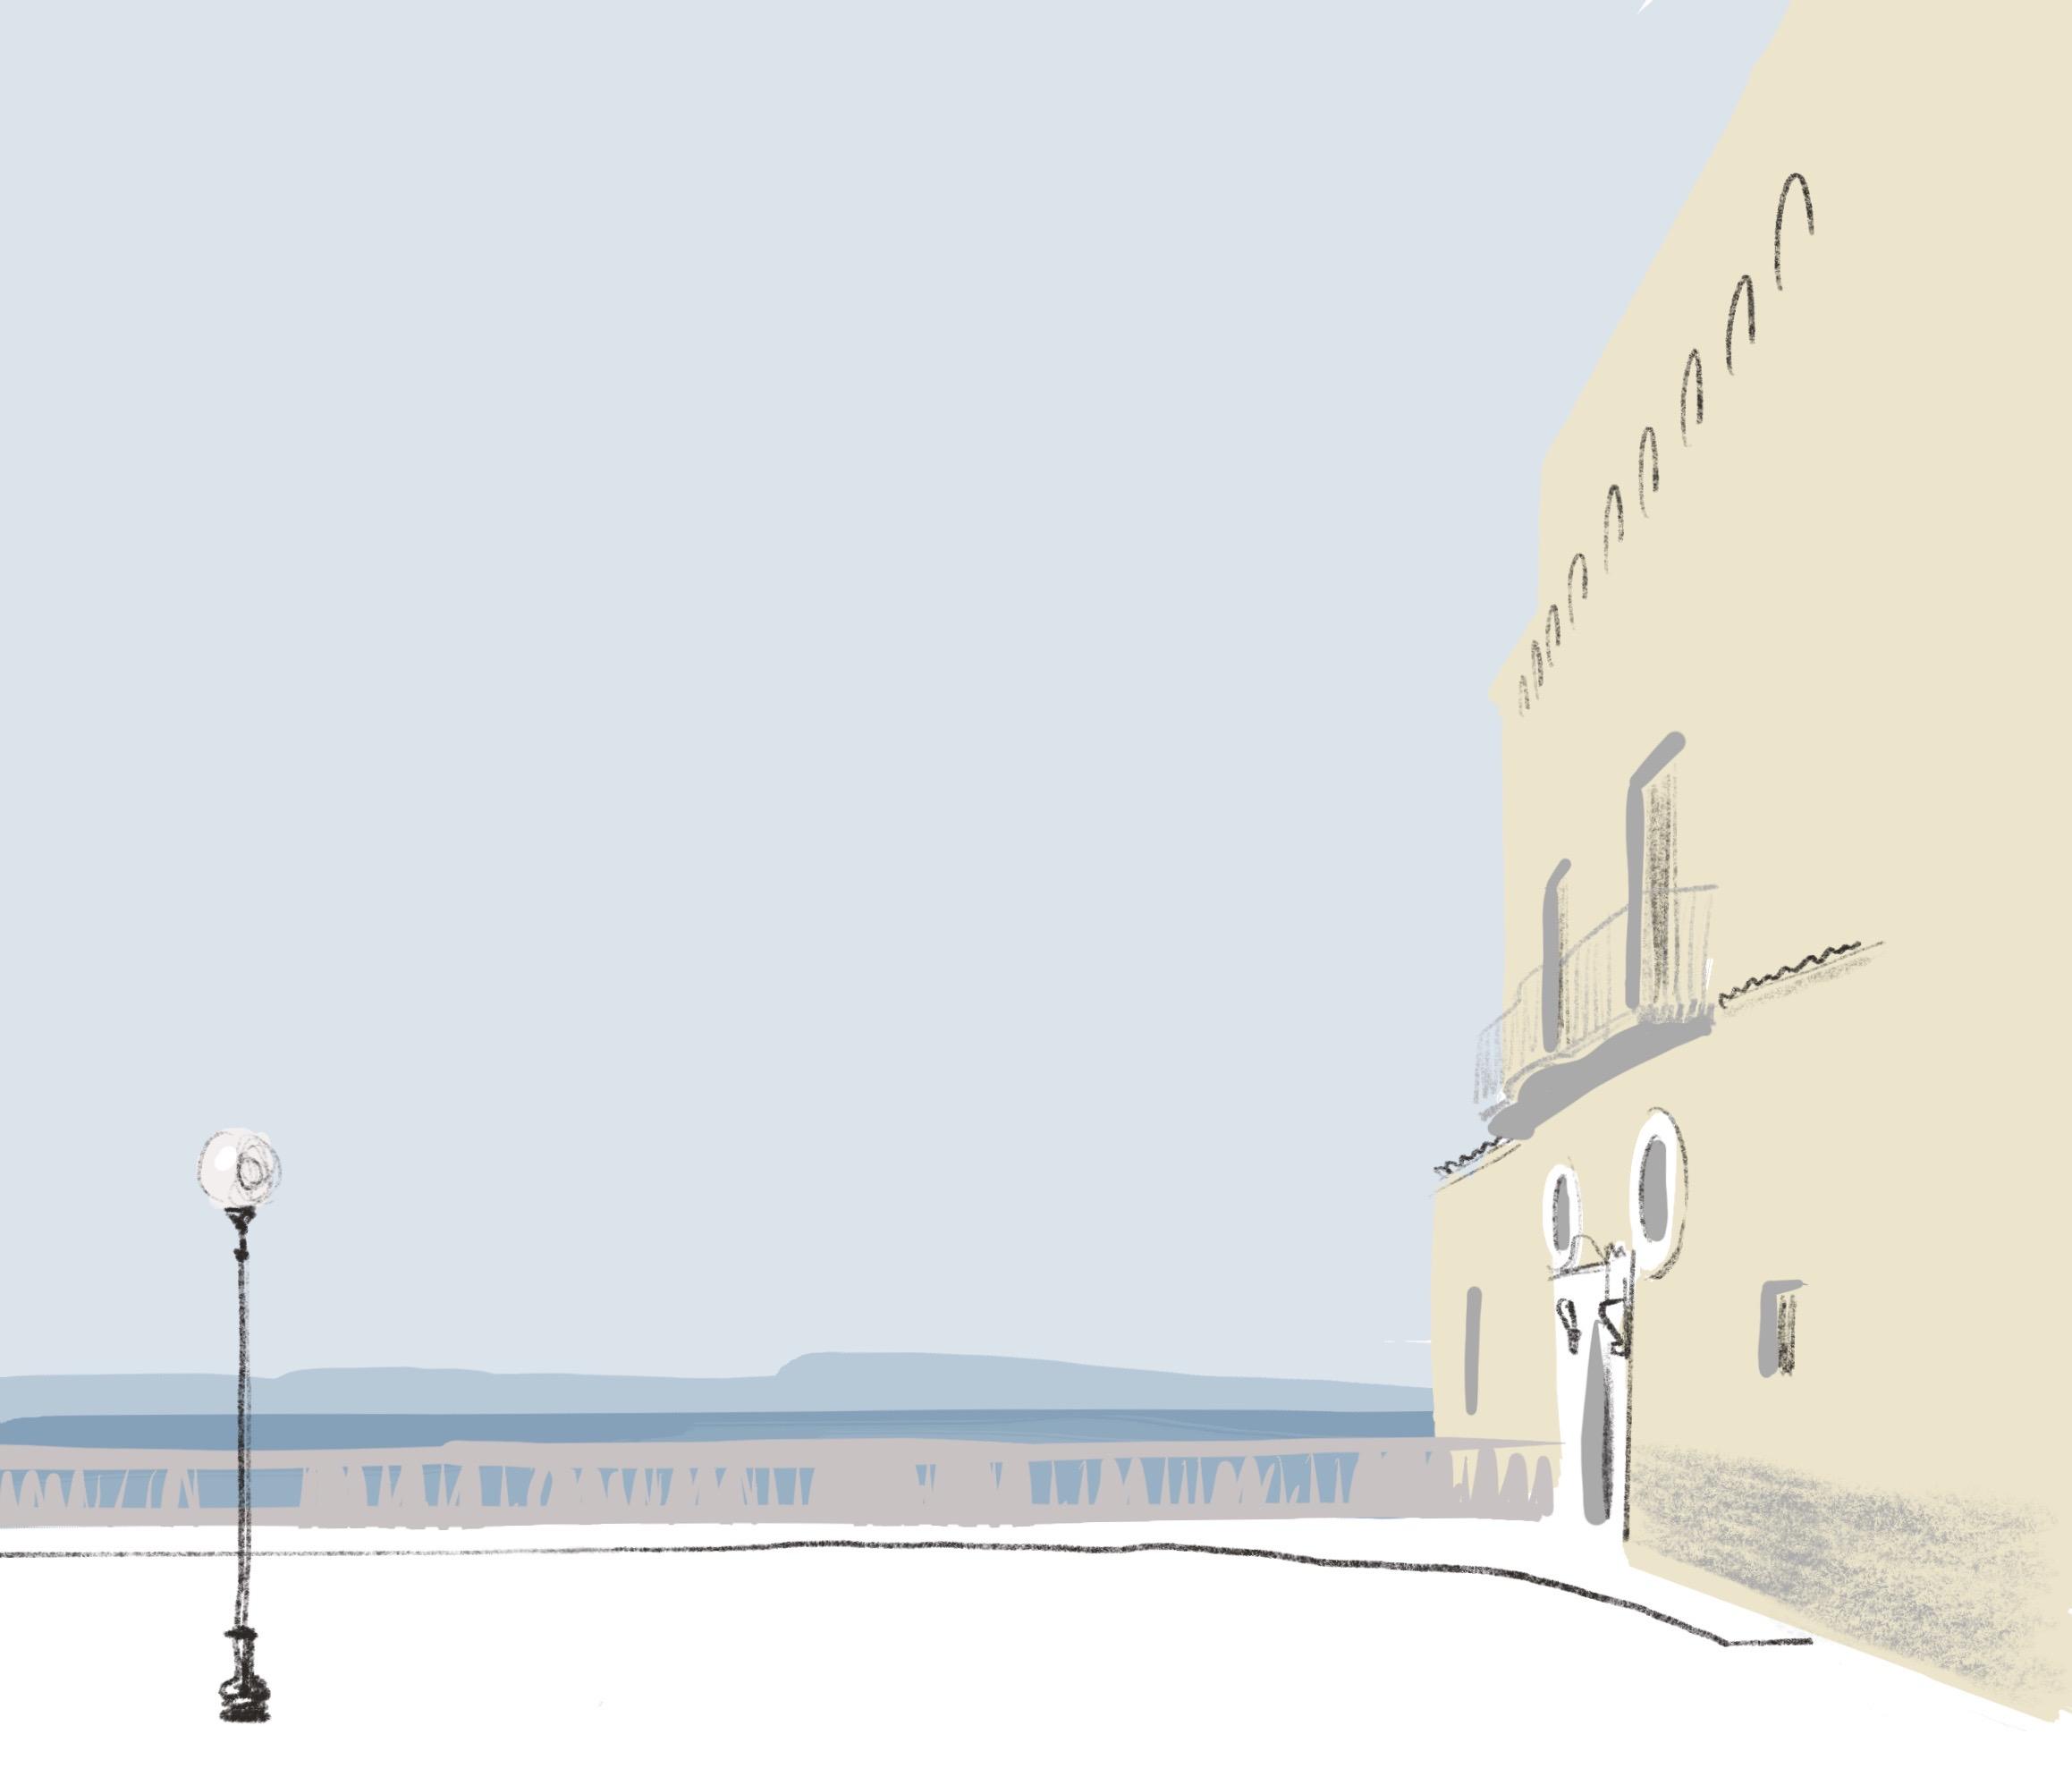 Italian Architecture illustration by Silvana Mariani